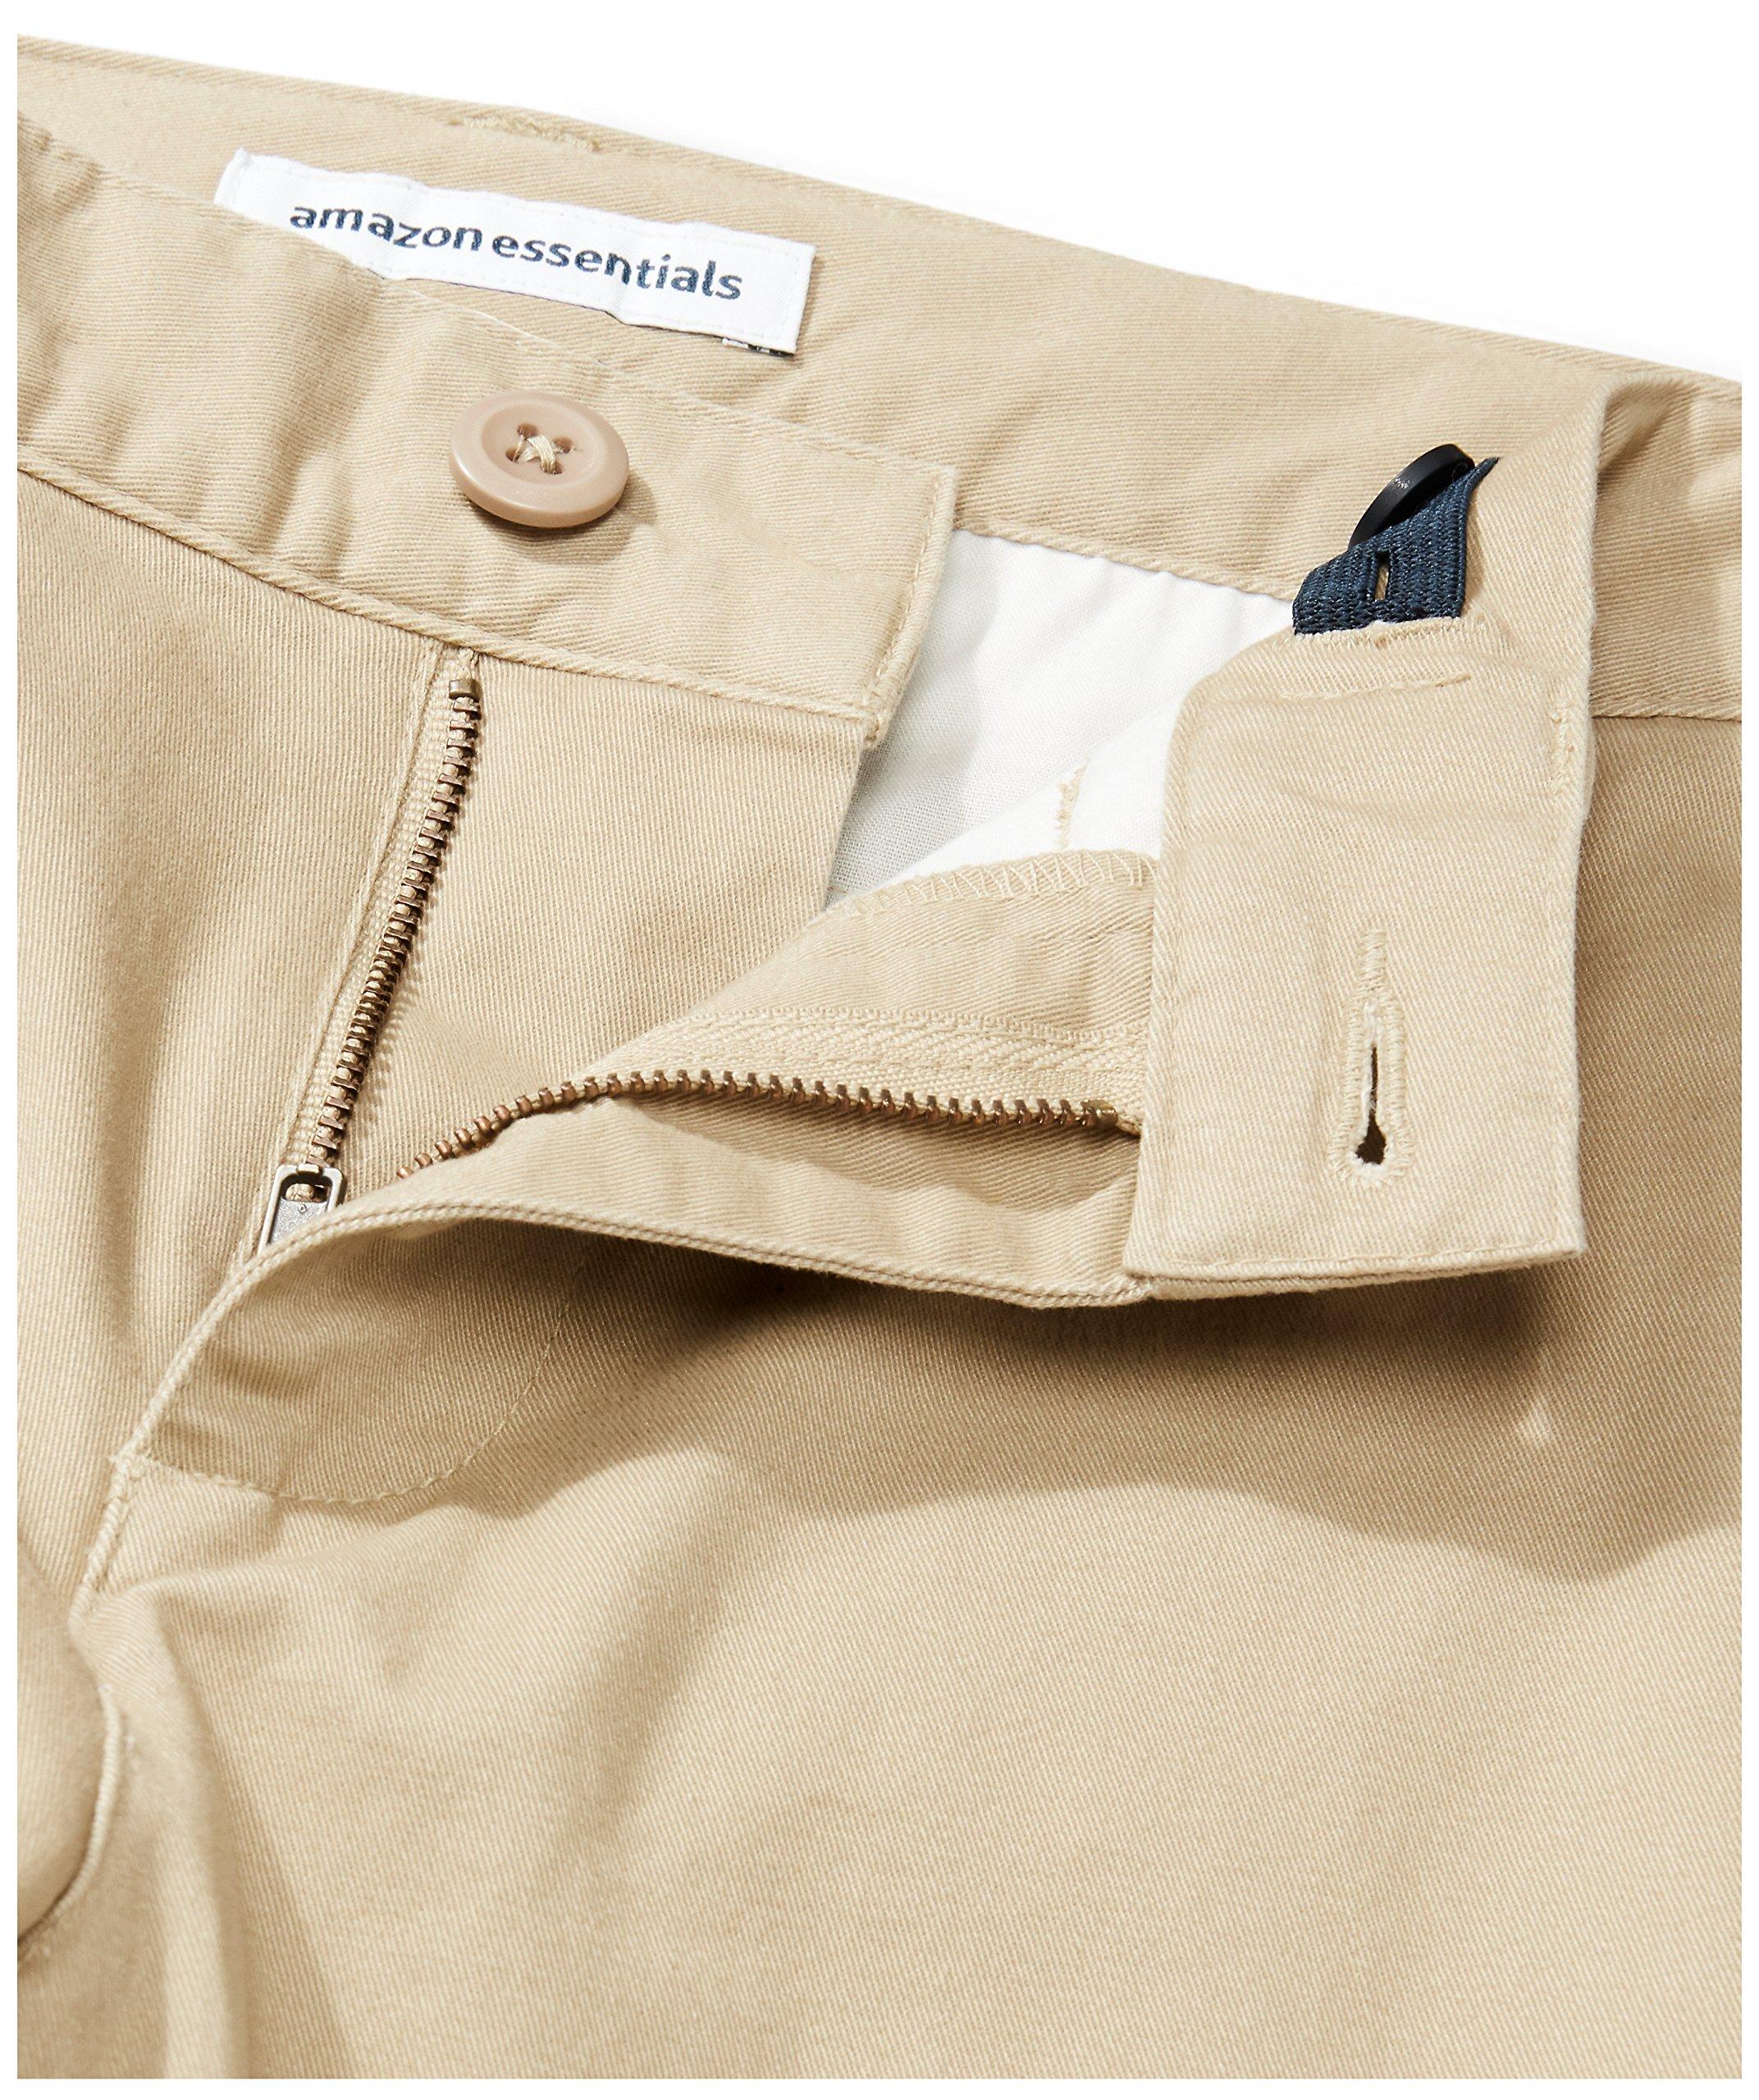 Amazon Essentials Boys' Straight Leg Flat Front Uniform Chino Pant, Khaki,10 by Amazon Essentials (Image #4)